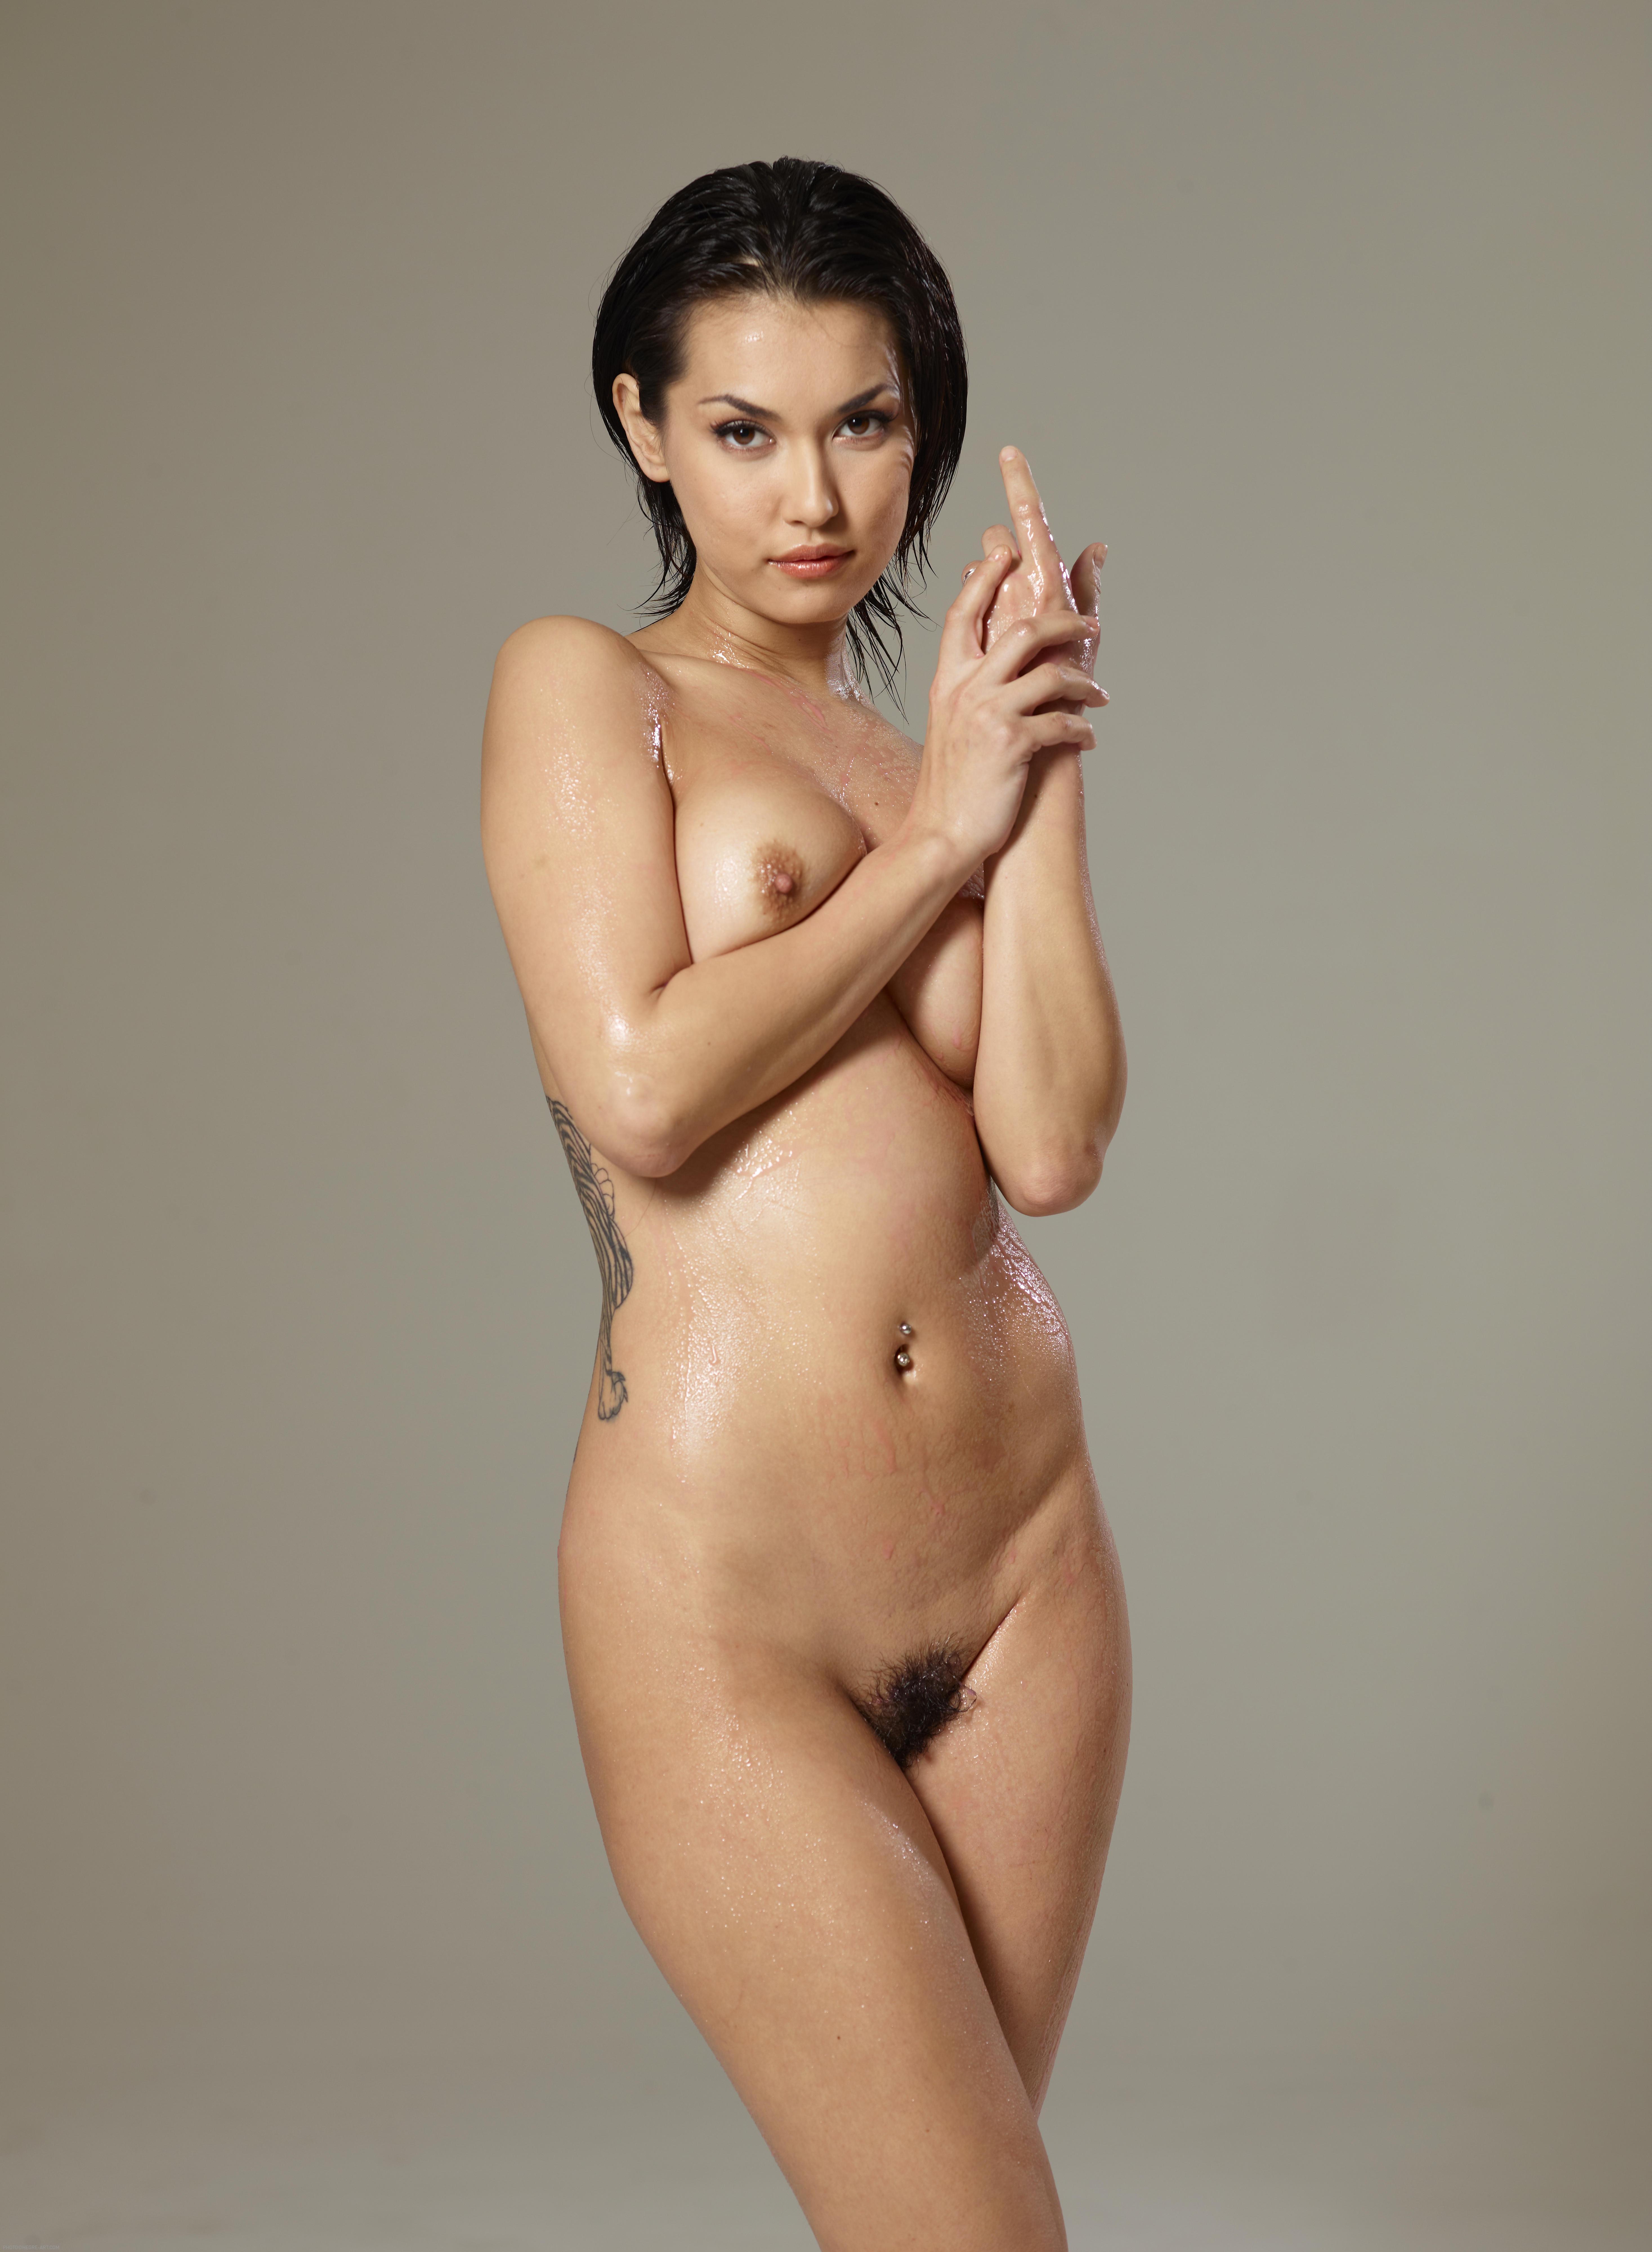 maria ozawa nude photo 67   hot girls wallpaper